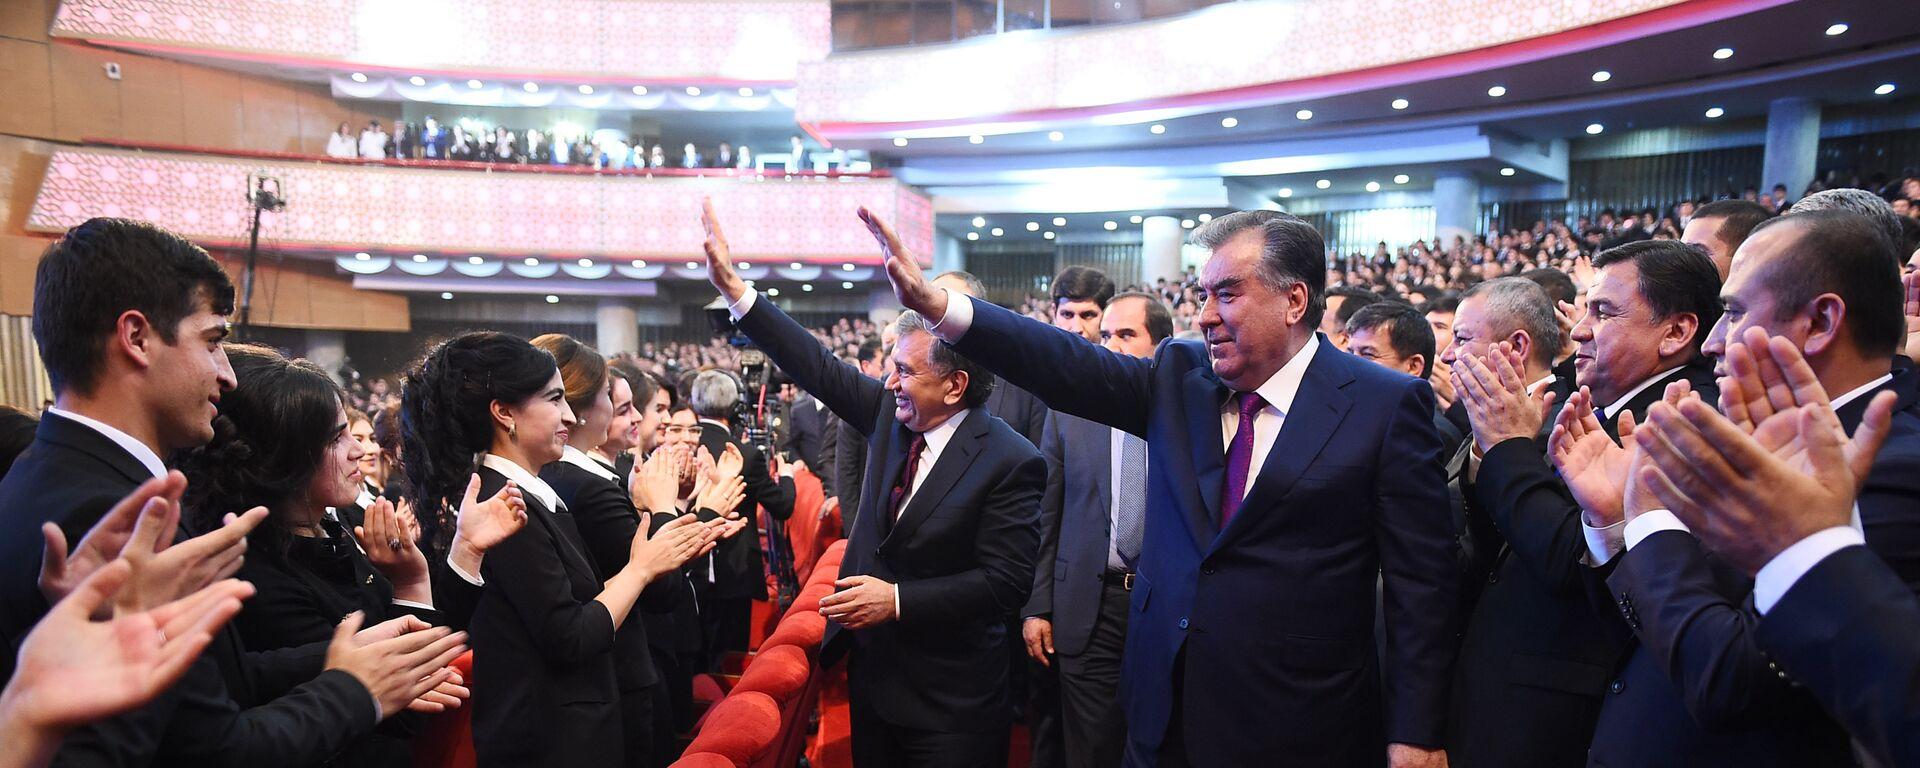 Президент Узбекистана Шавкат Мирзиёев и президент Таджикистана Эмомали Рахмон  - Sputnik Таджикистан, 1920, 08.06.2021